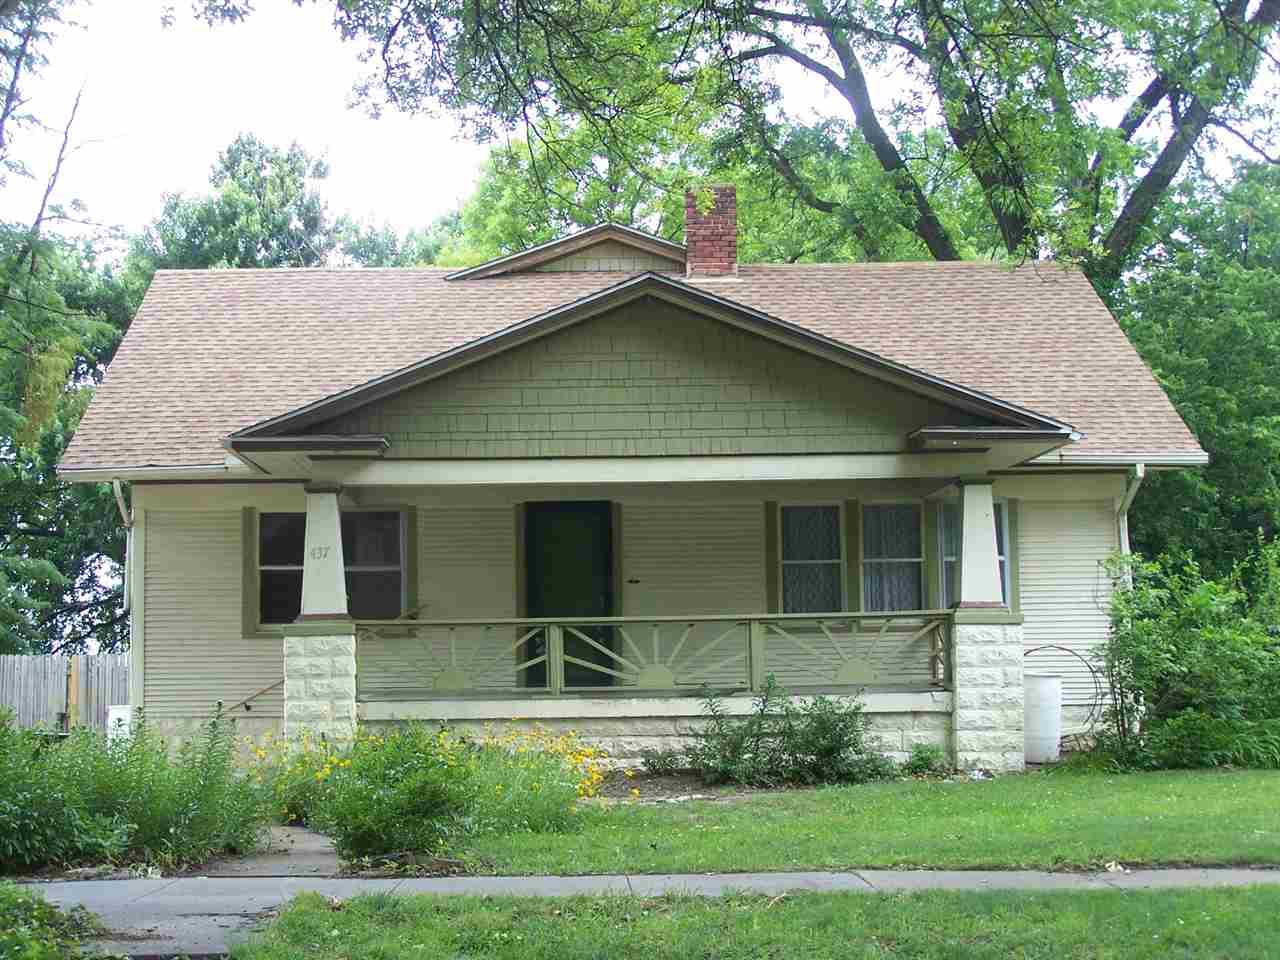 437 S Clifton Ave, Wichita, KS 67218